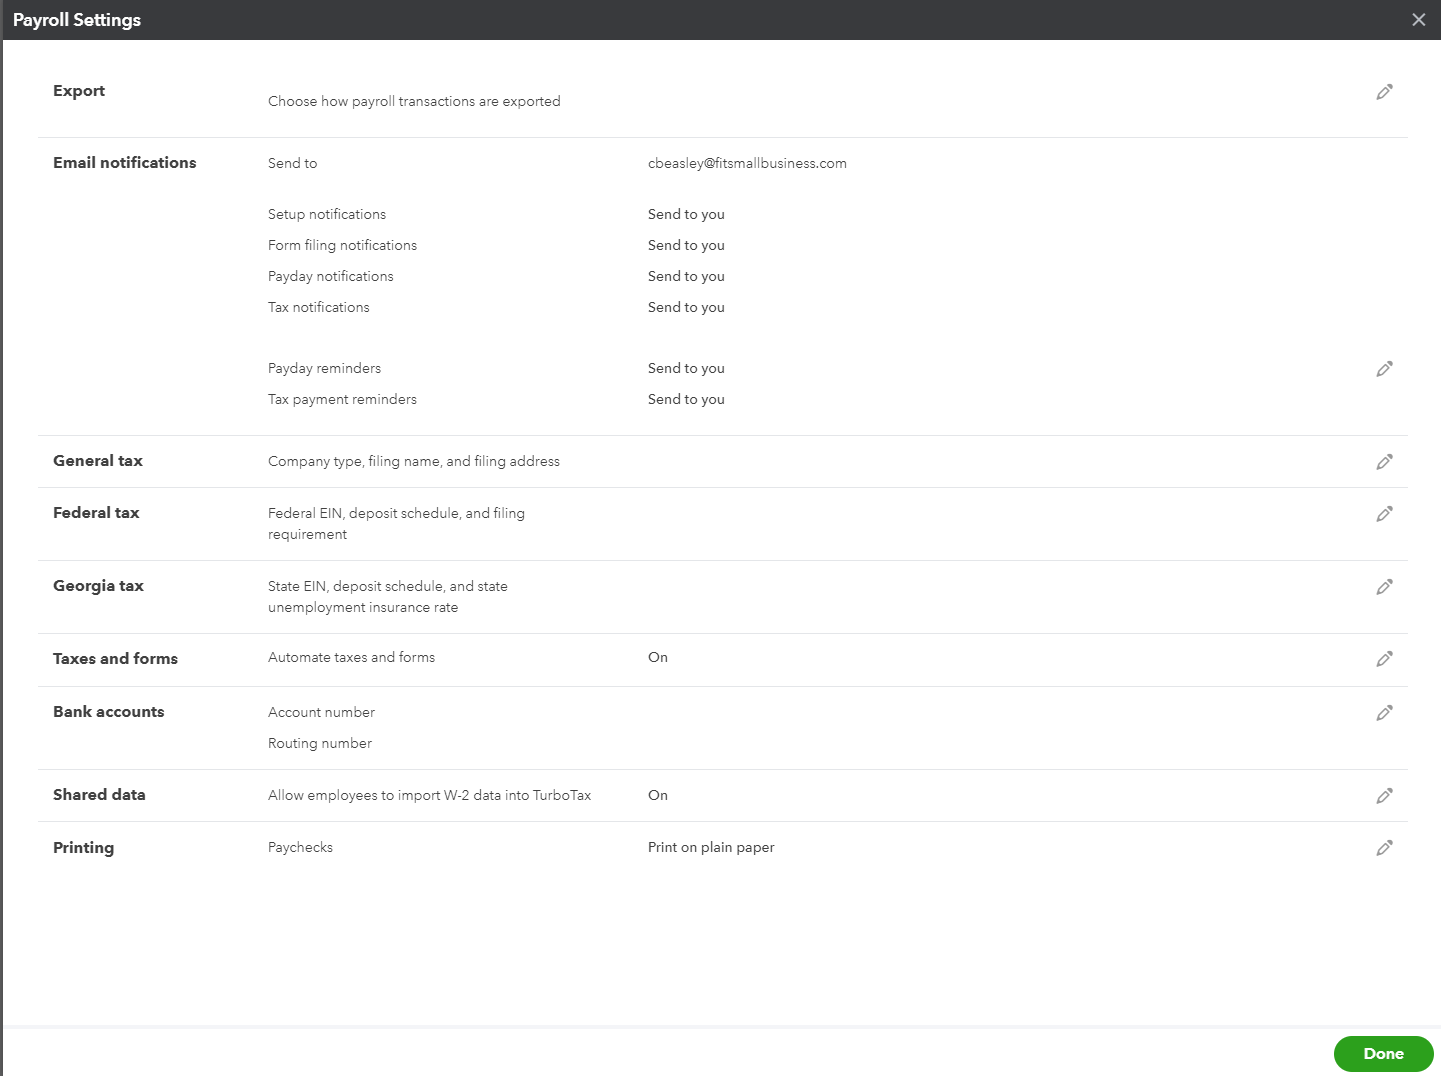 Screenshot of Payroll Settings on QuickBooks